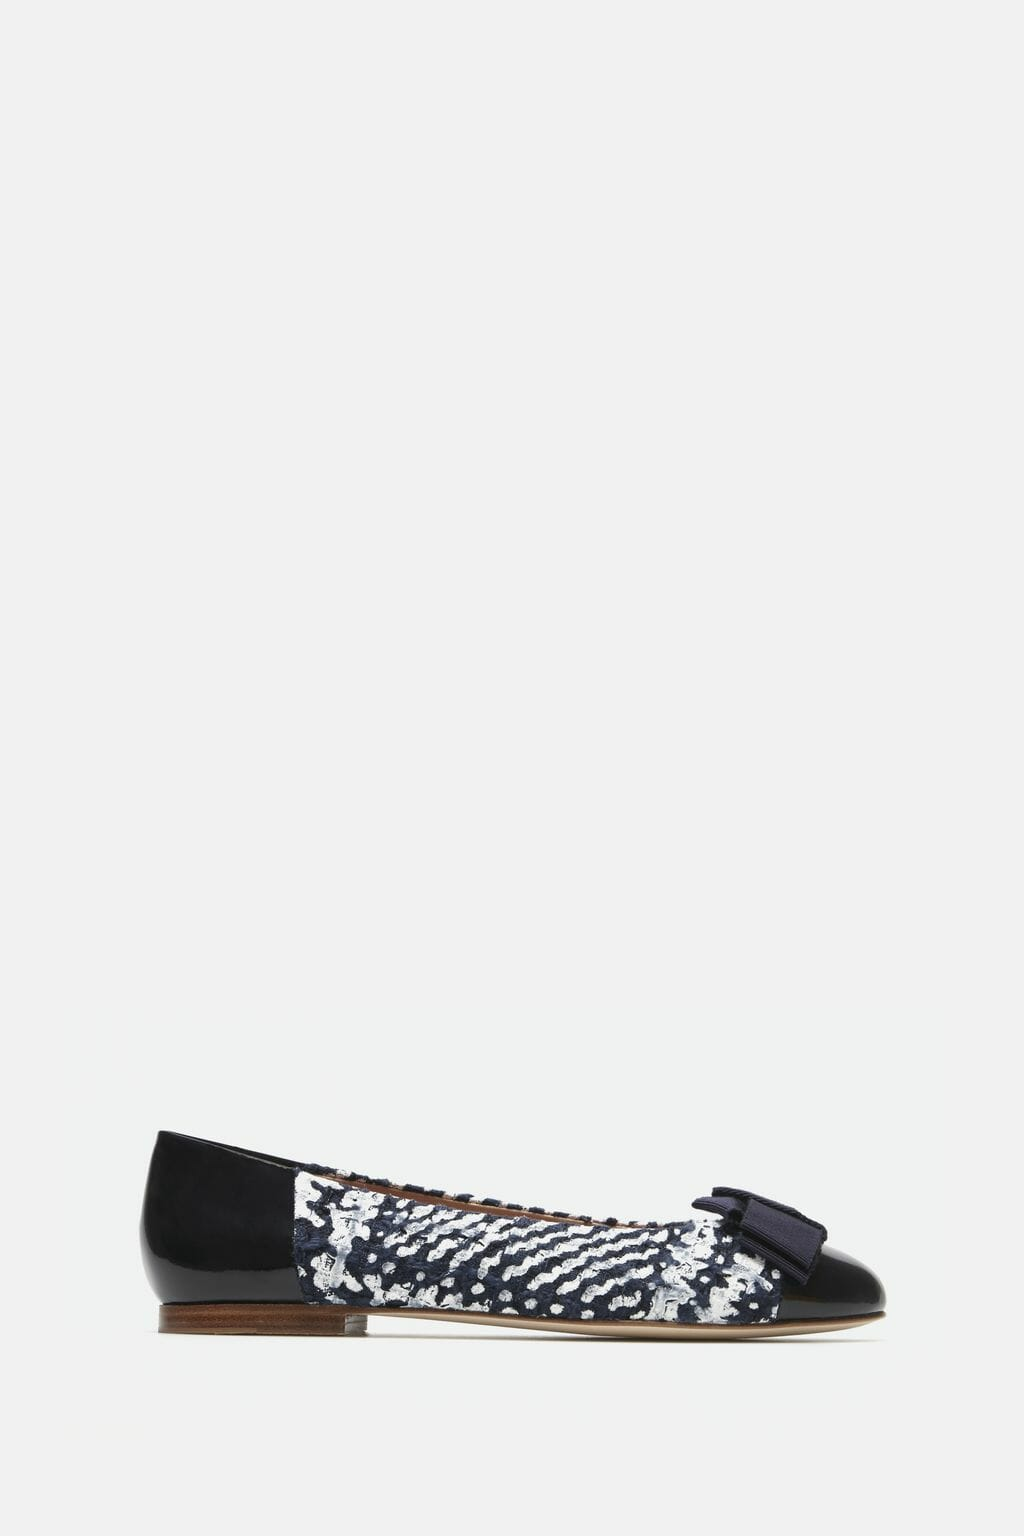 CH-Carolina-herrera-shoes-collection-Spring-Summer-2018-shoe-70